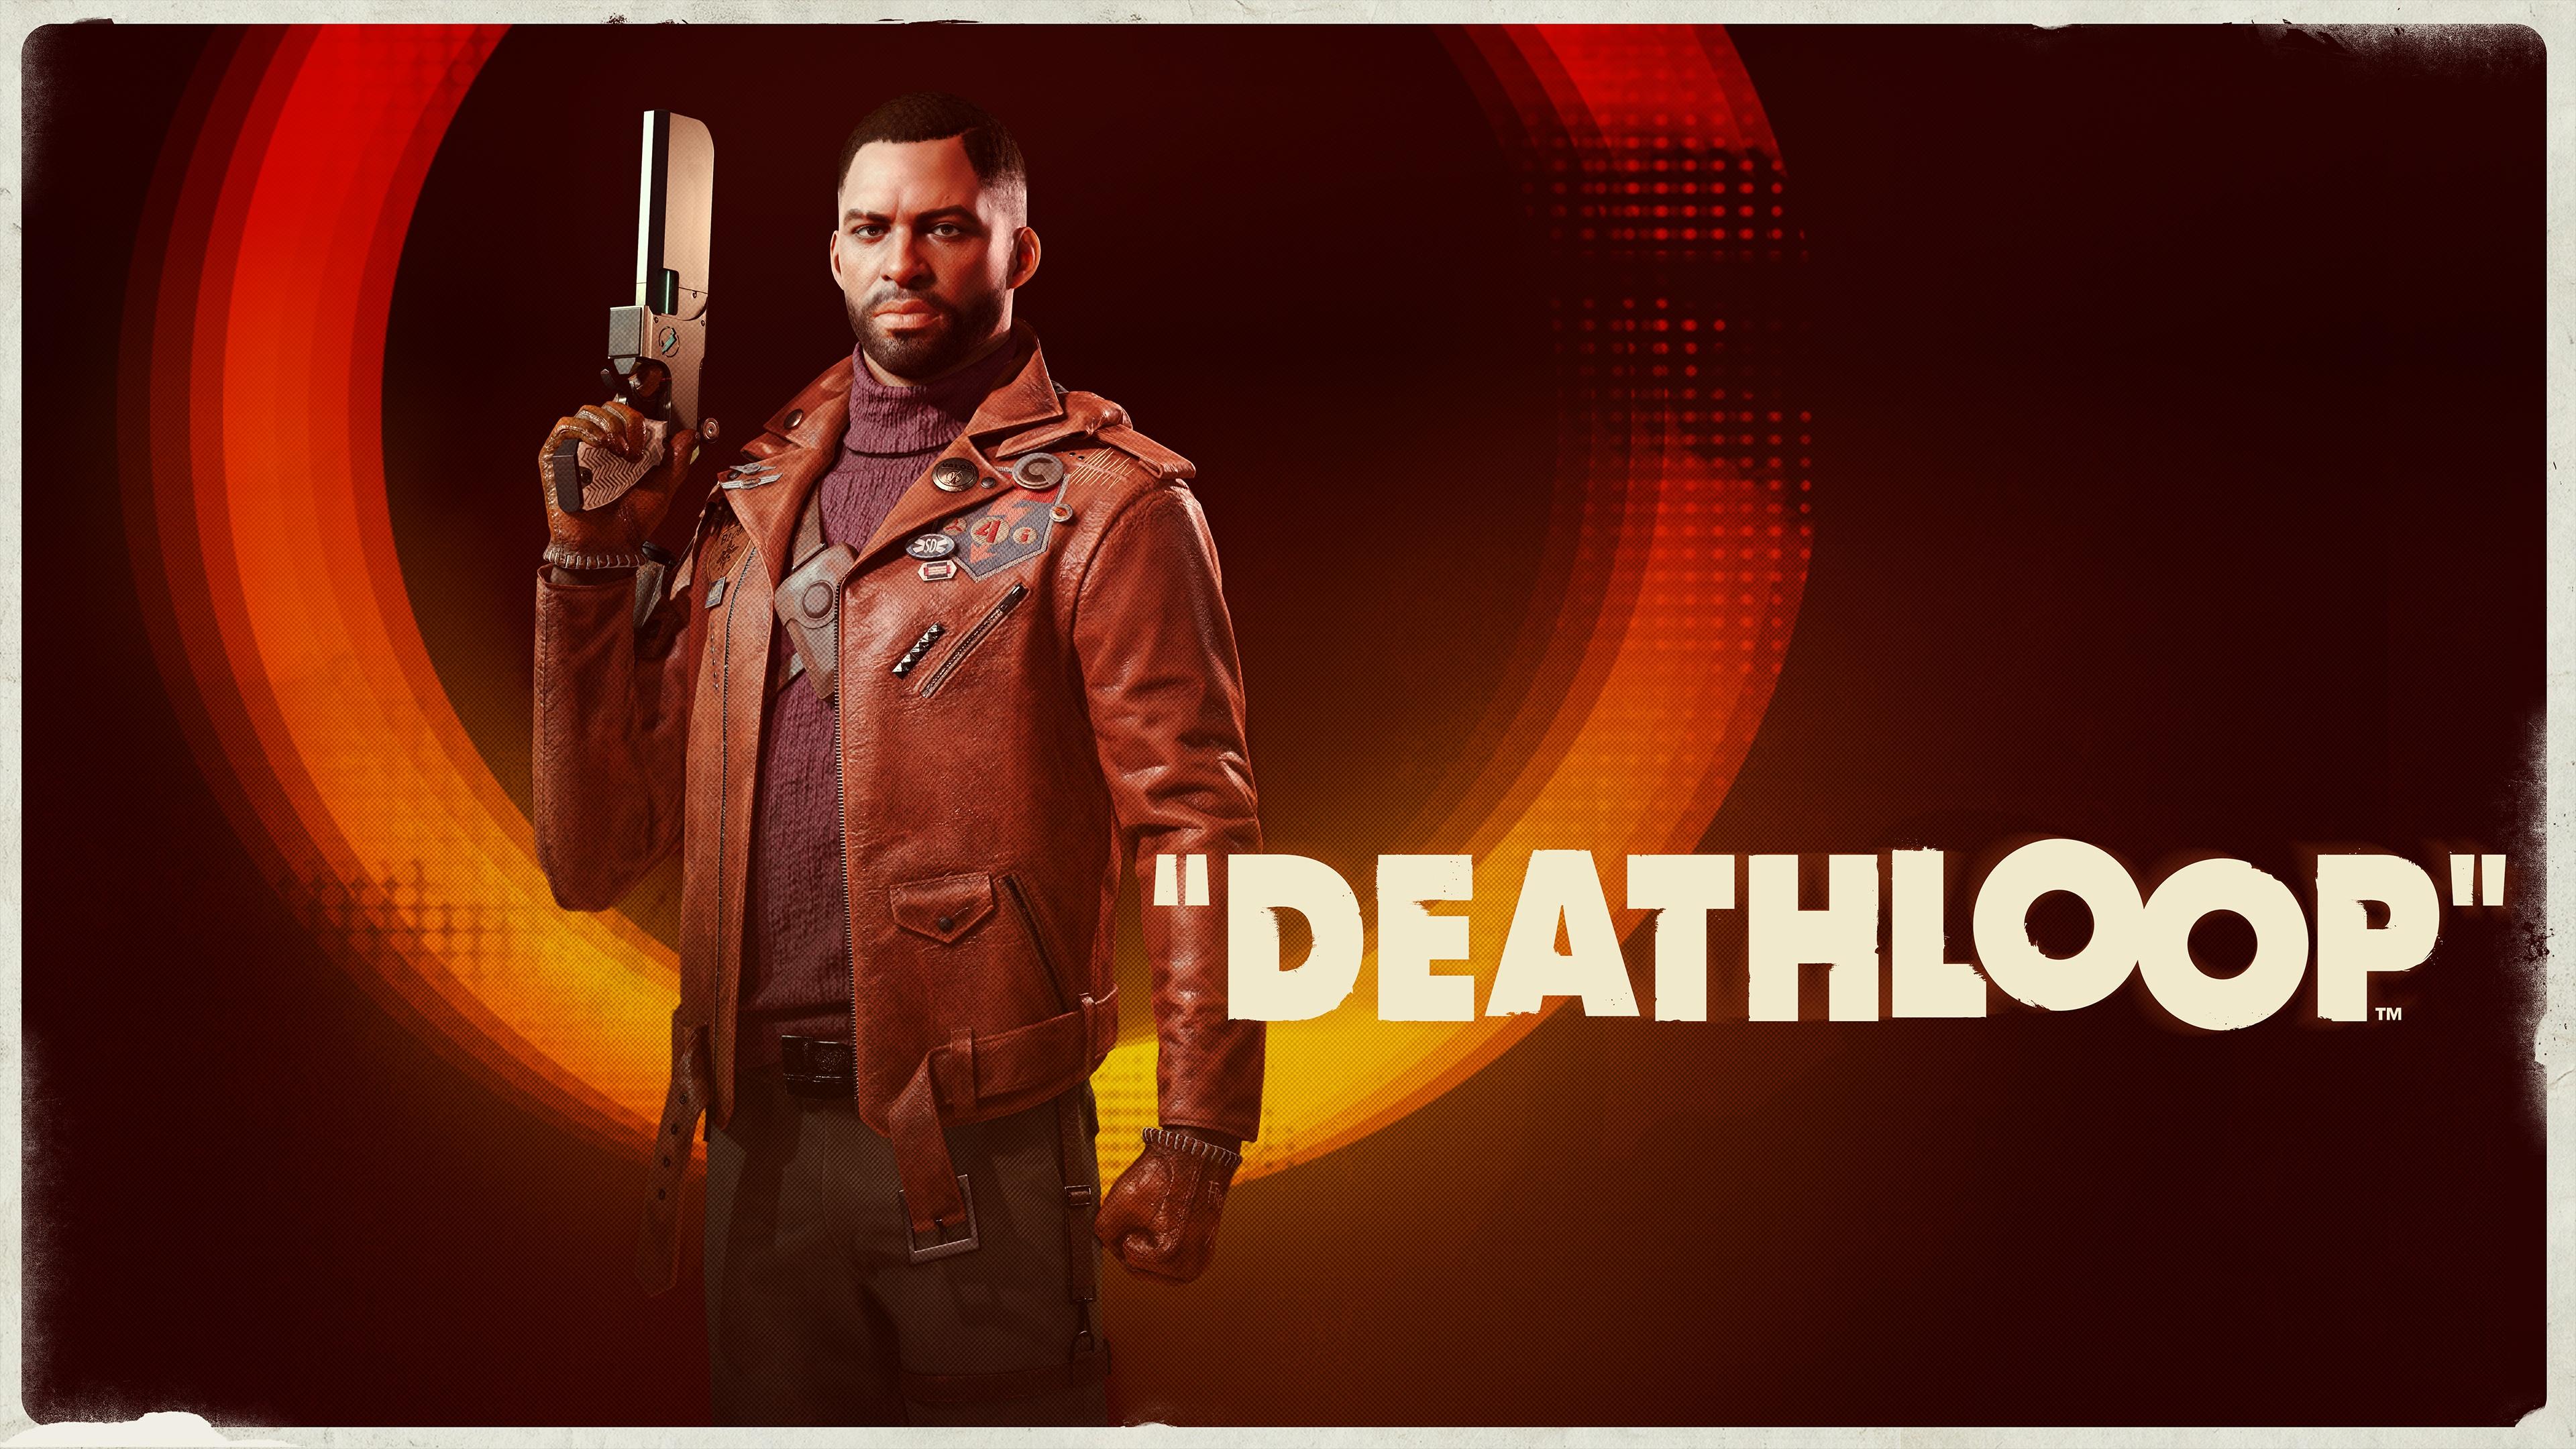 Colt holding a gun in Deathloop